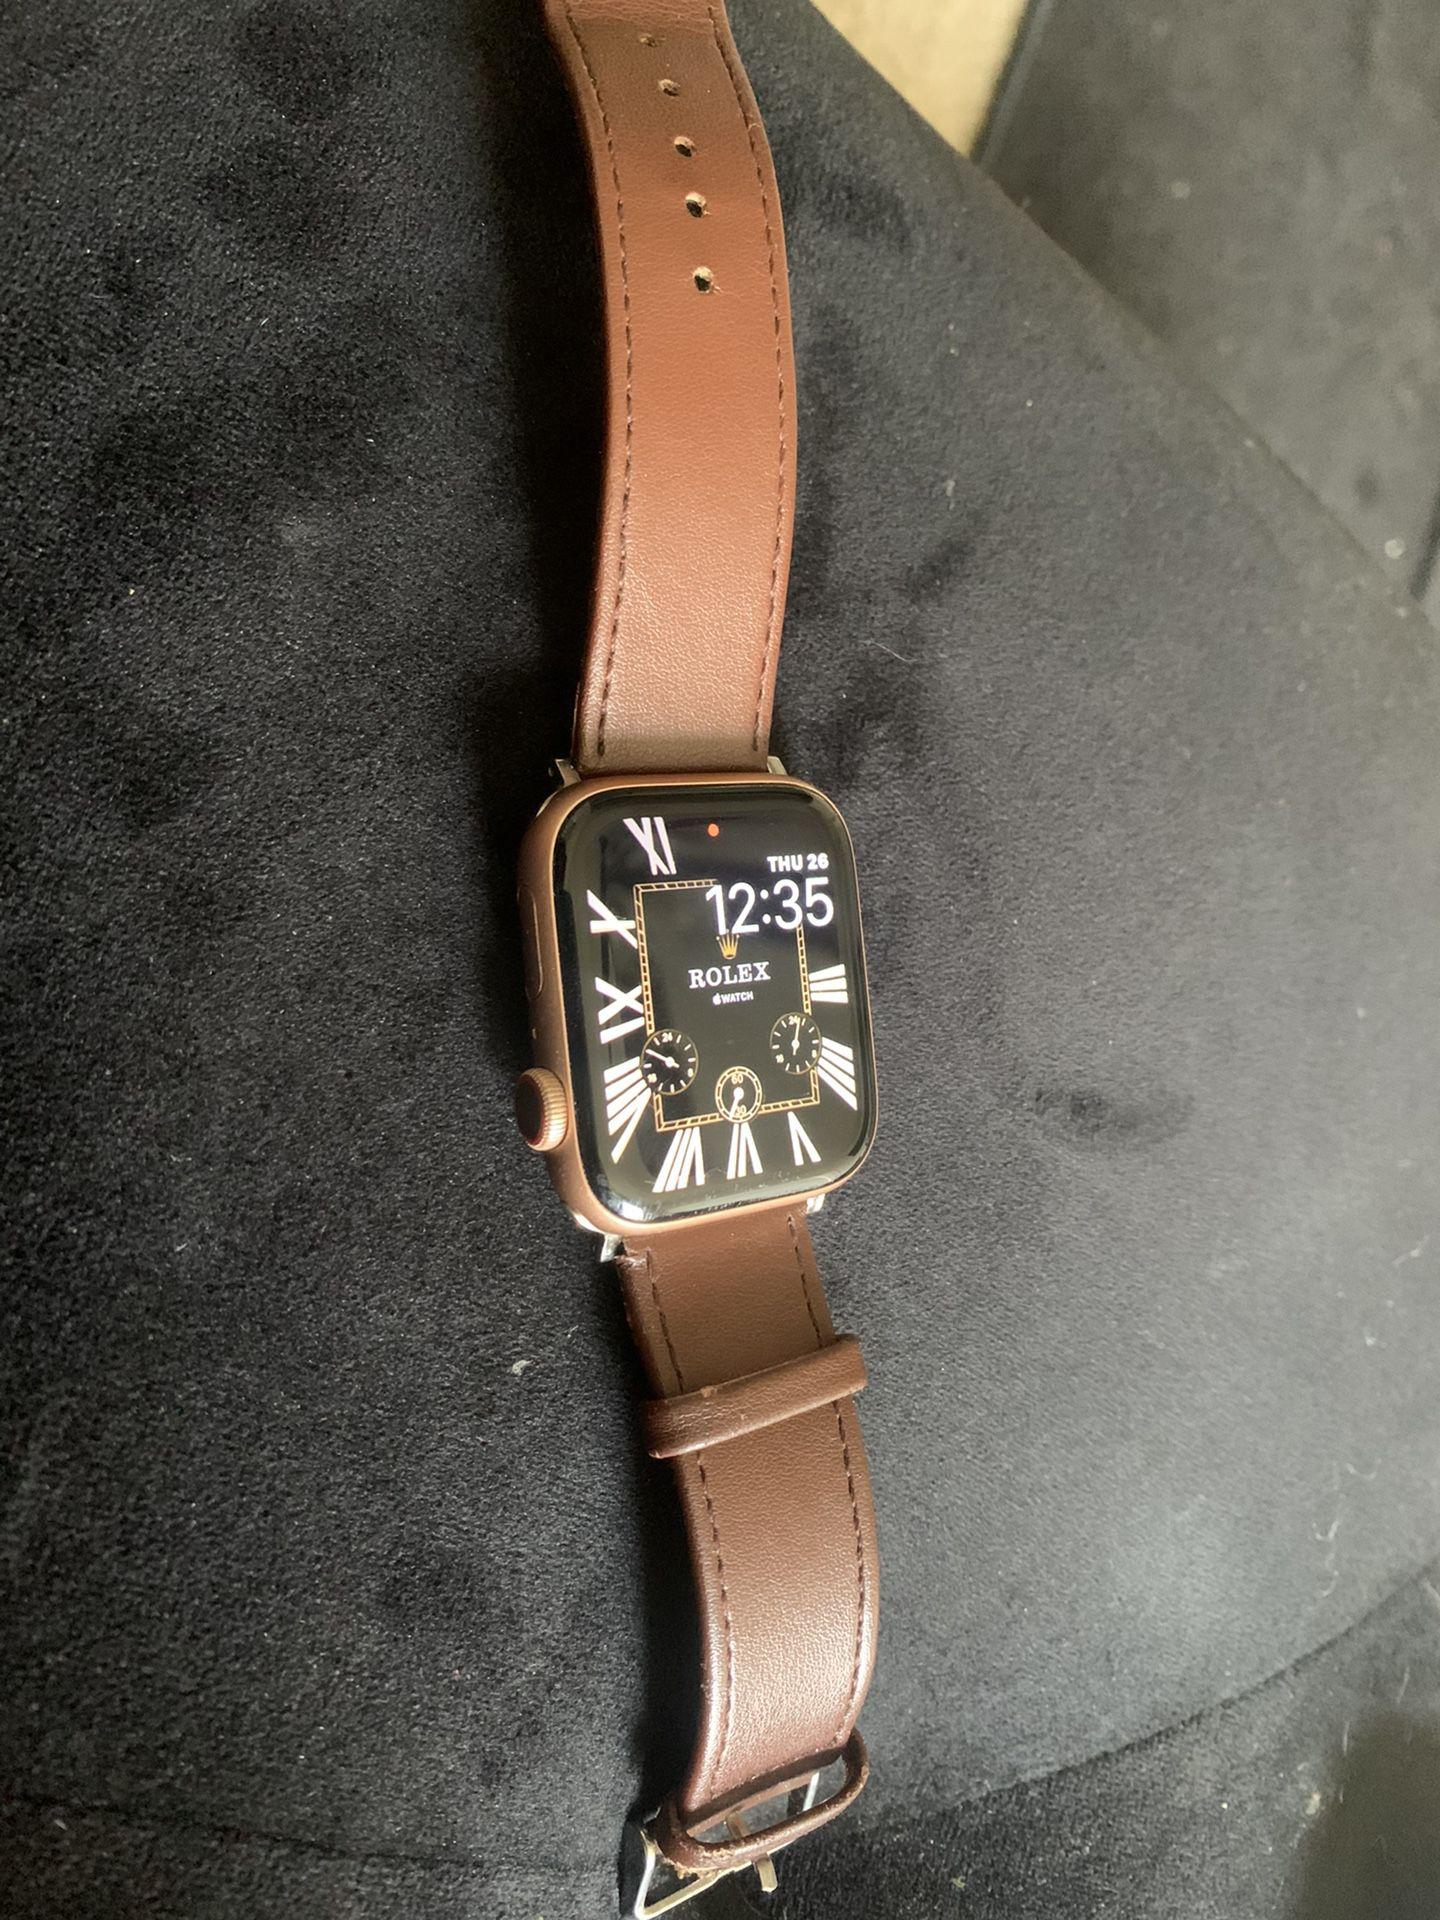 Apple Watch Series 5 44mm Lte Gps